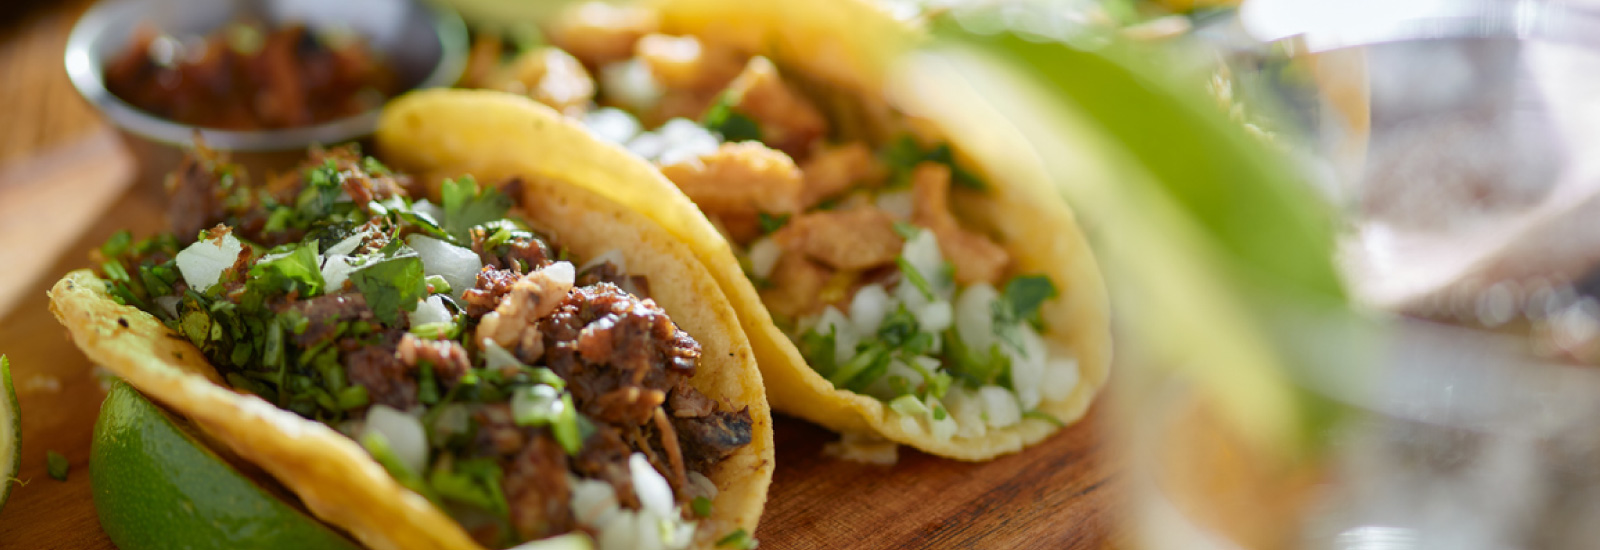 Mexican Restaurants in Yuba City